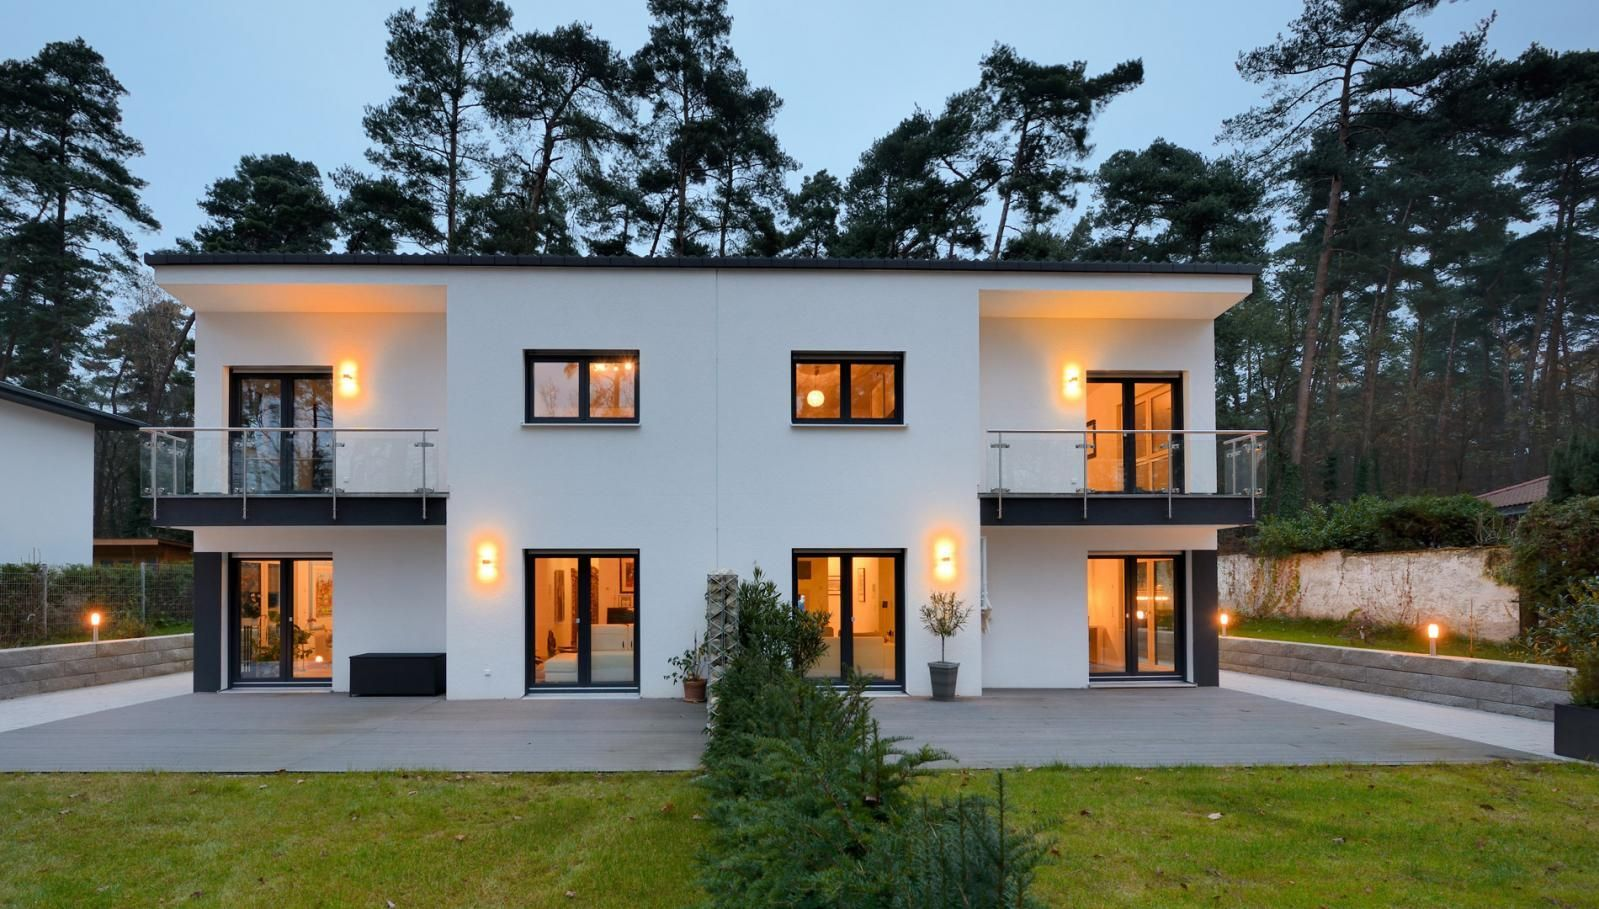 Haus Knüpfer/Schmenger Haus, Doppelhaus bauen